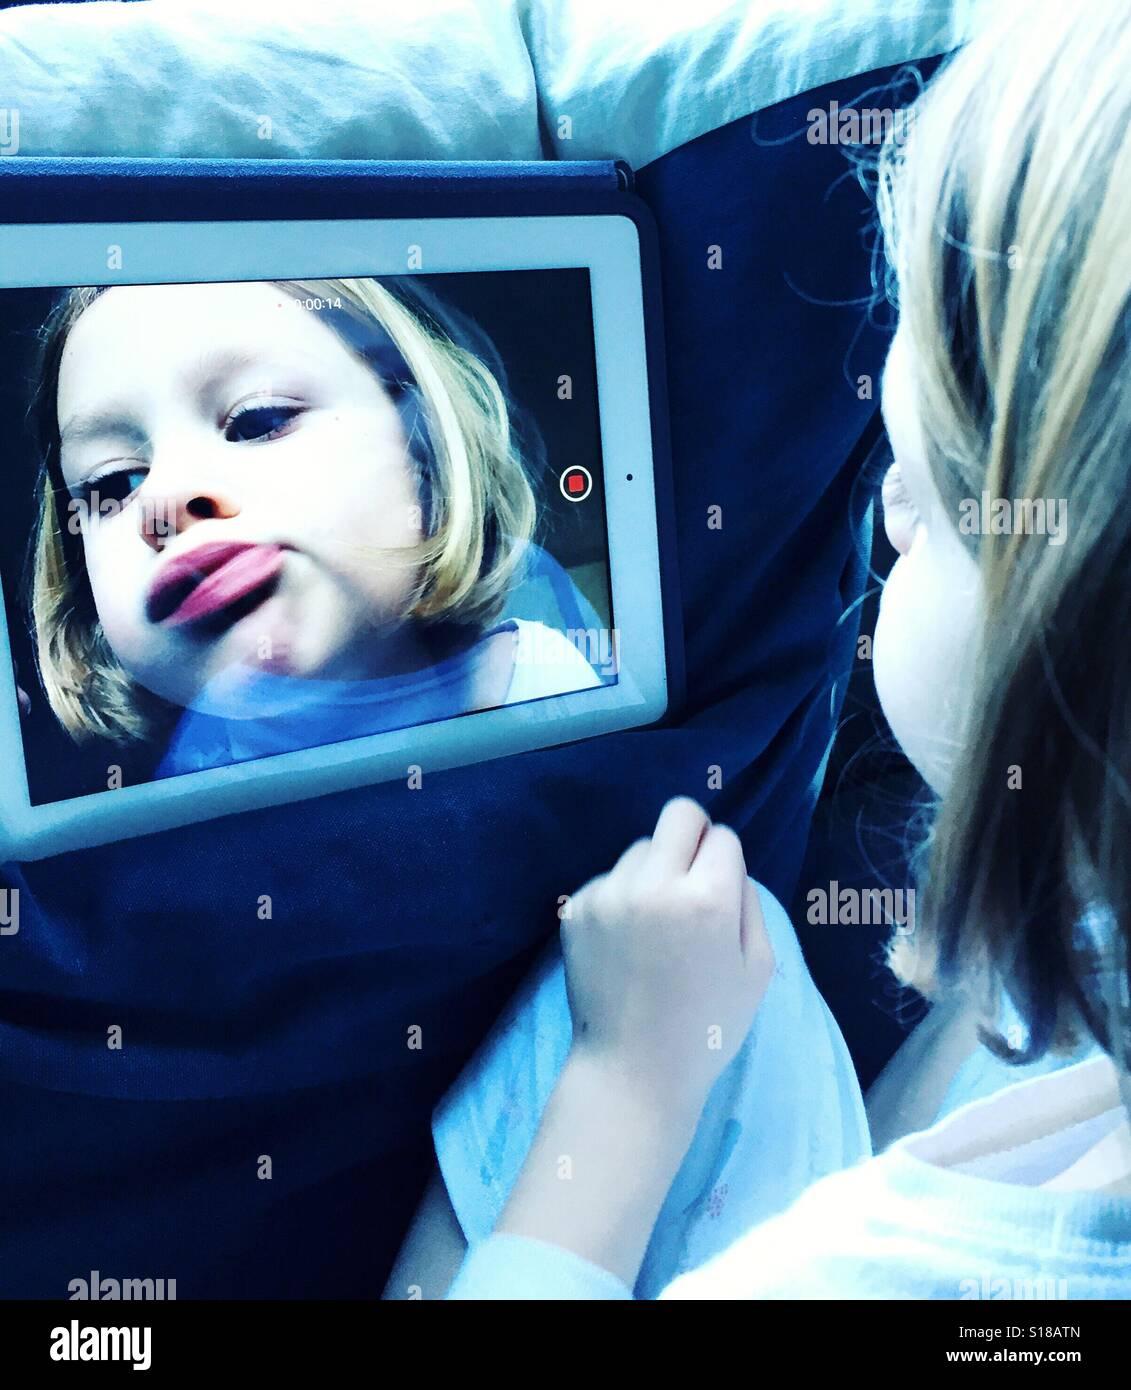 big lips stock photos & big lips stock images - alamy